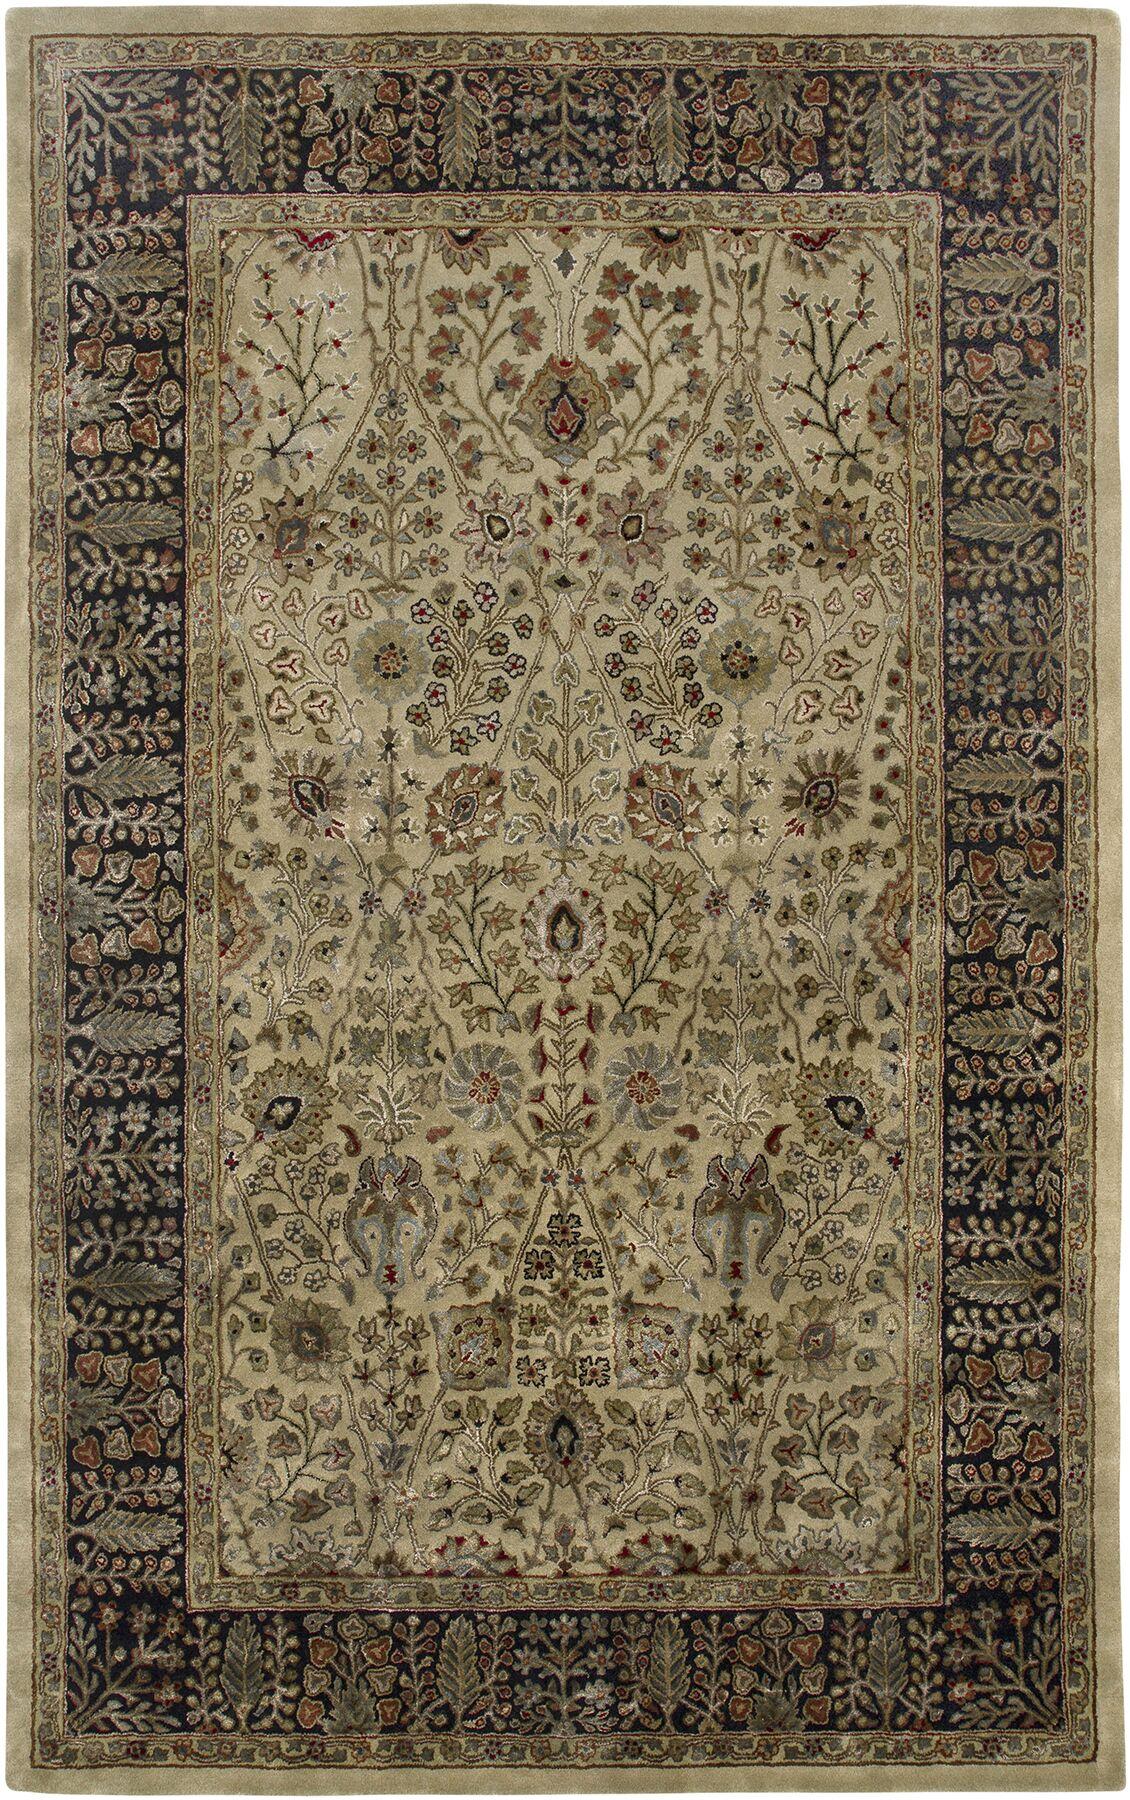 Cloverdales Gold/Ebony Area Rug Rug Size: Rectangle 5'6